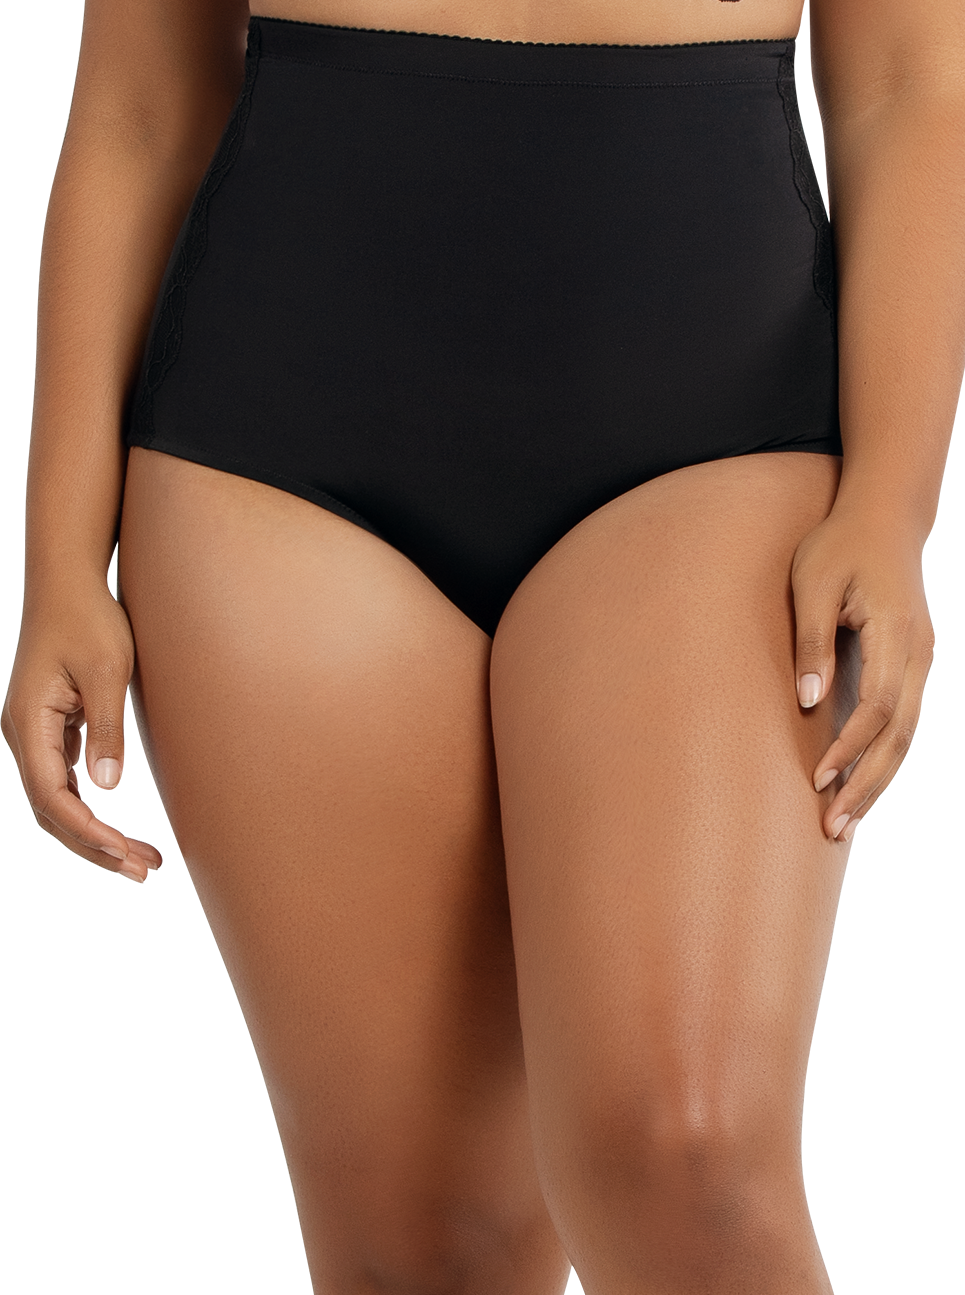 PARFAIT Elissa SuperHighwaistedSmoothControlPantyP50151 Black Front - Elissa Super Highwaisted Smooth Control Panty Black P50151